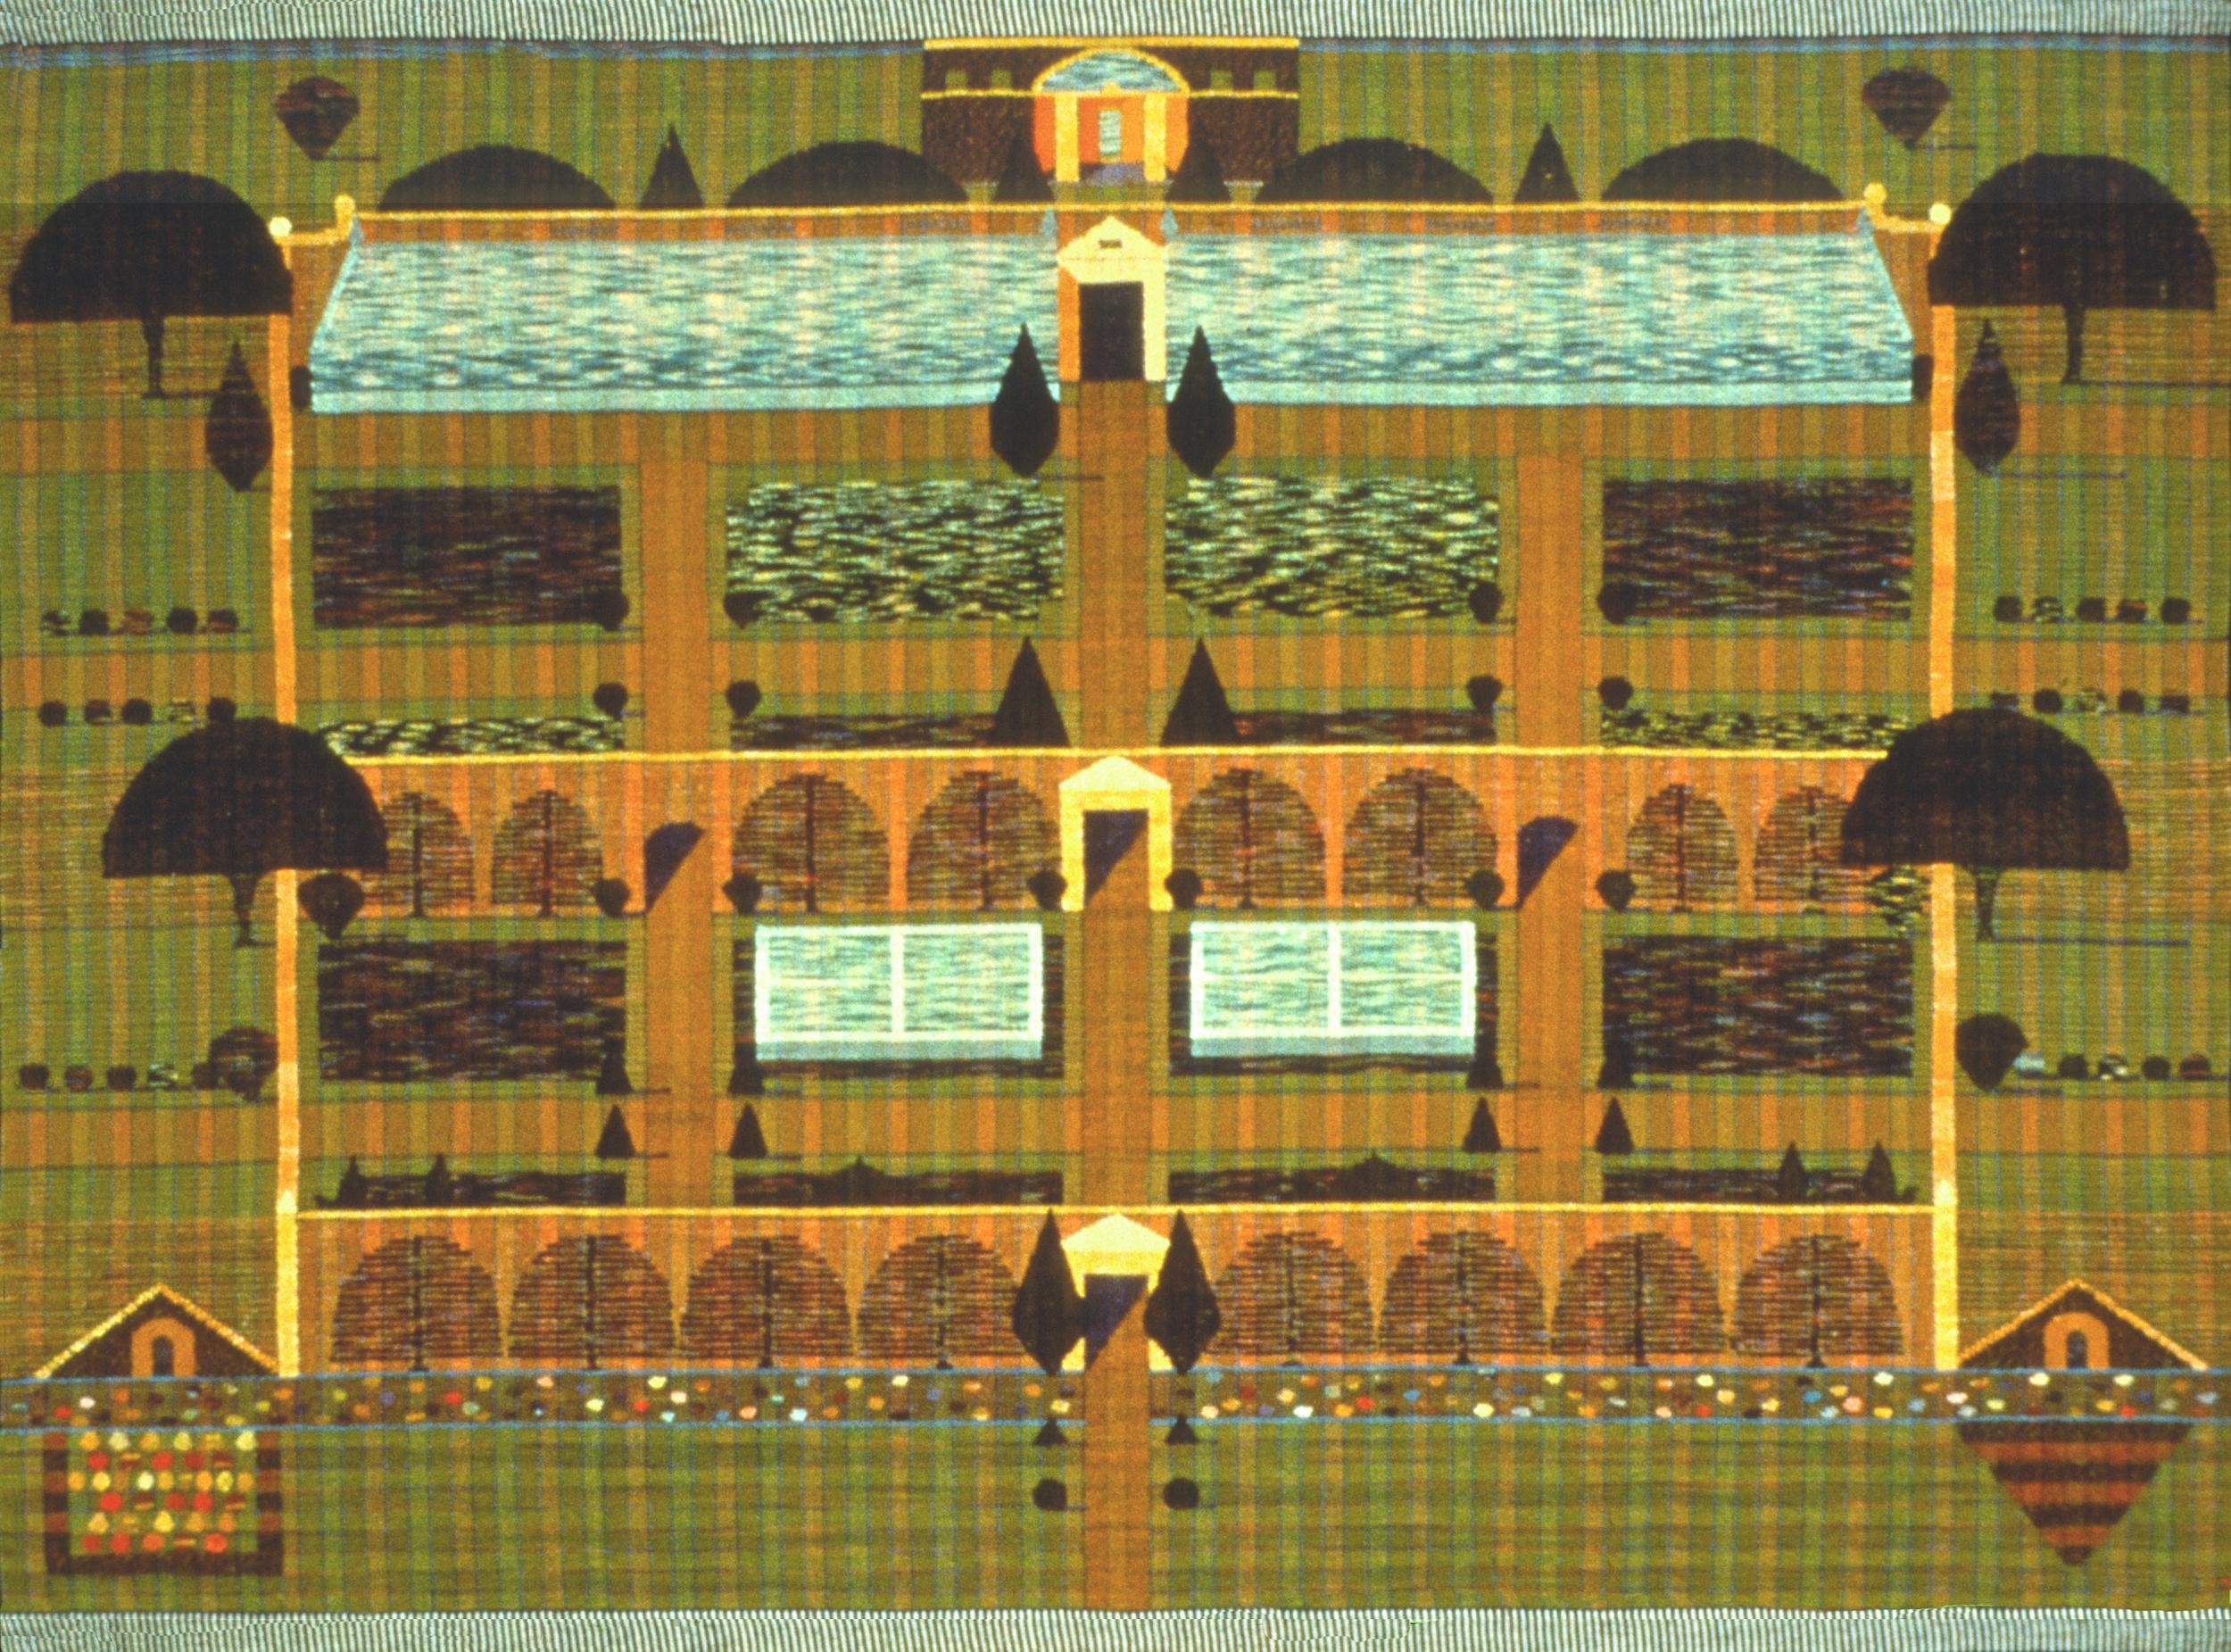 English walled garden 1989